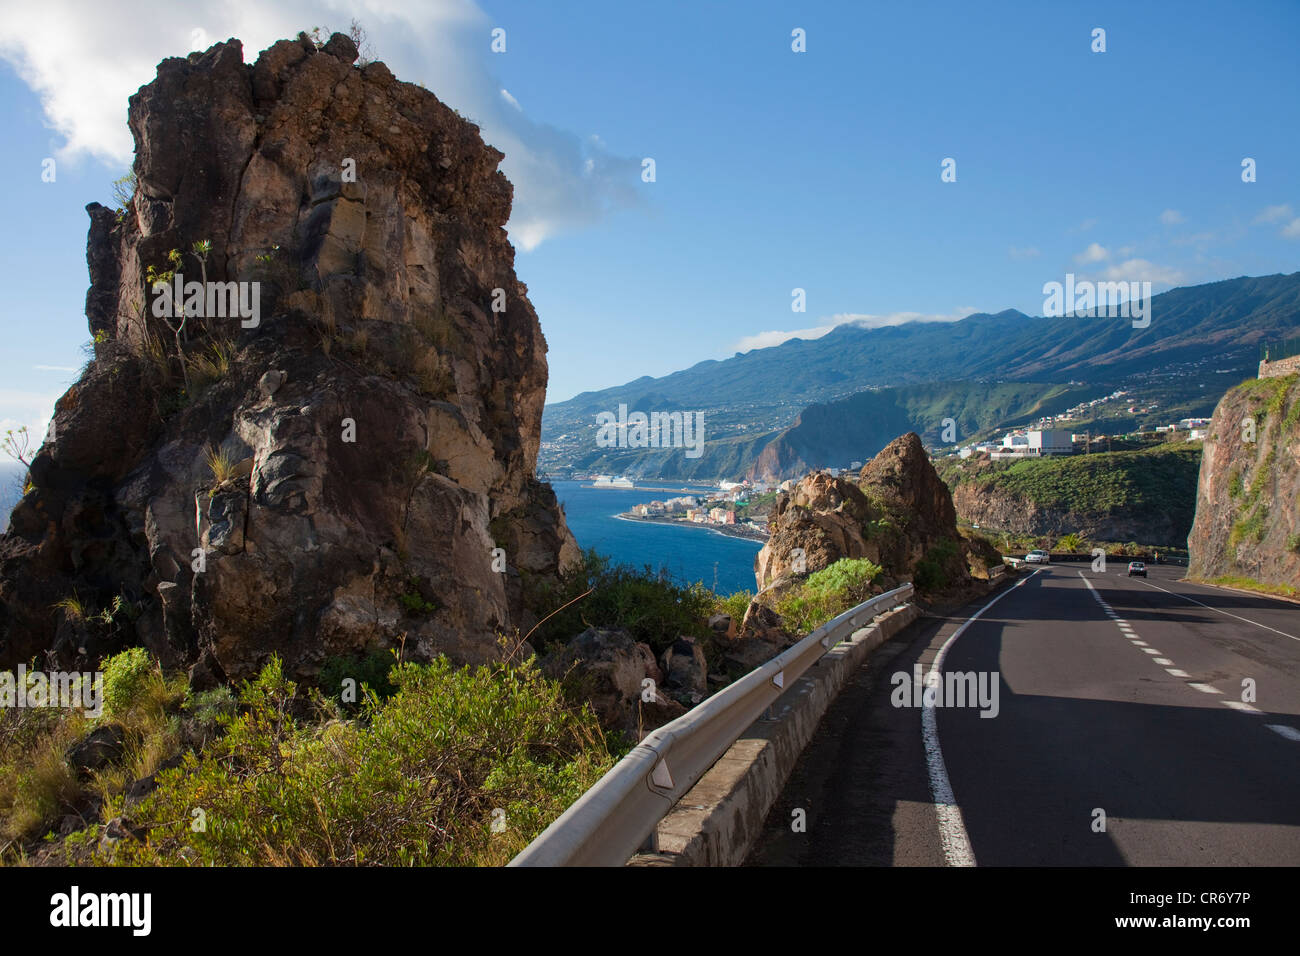 Küstenstraße in Santa Cruz, La Palma, Kanarische Inseln, Spanien, Europa, Atlantik Stockbild